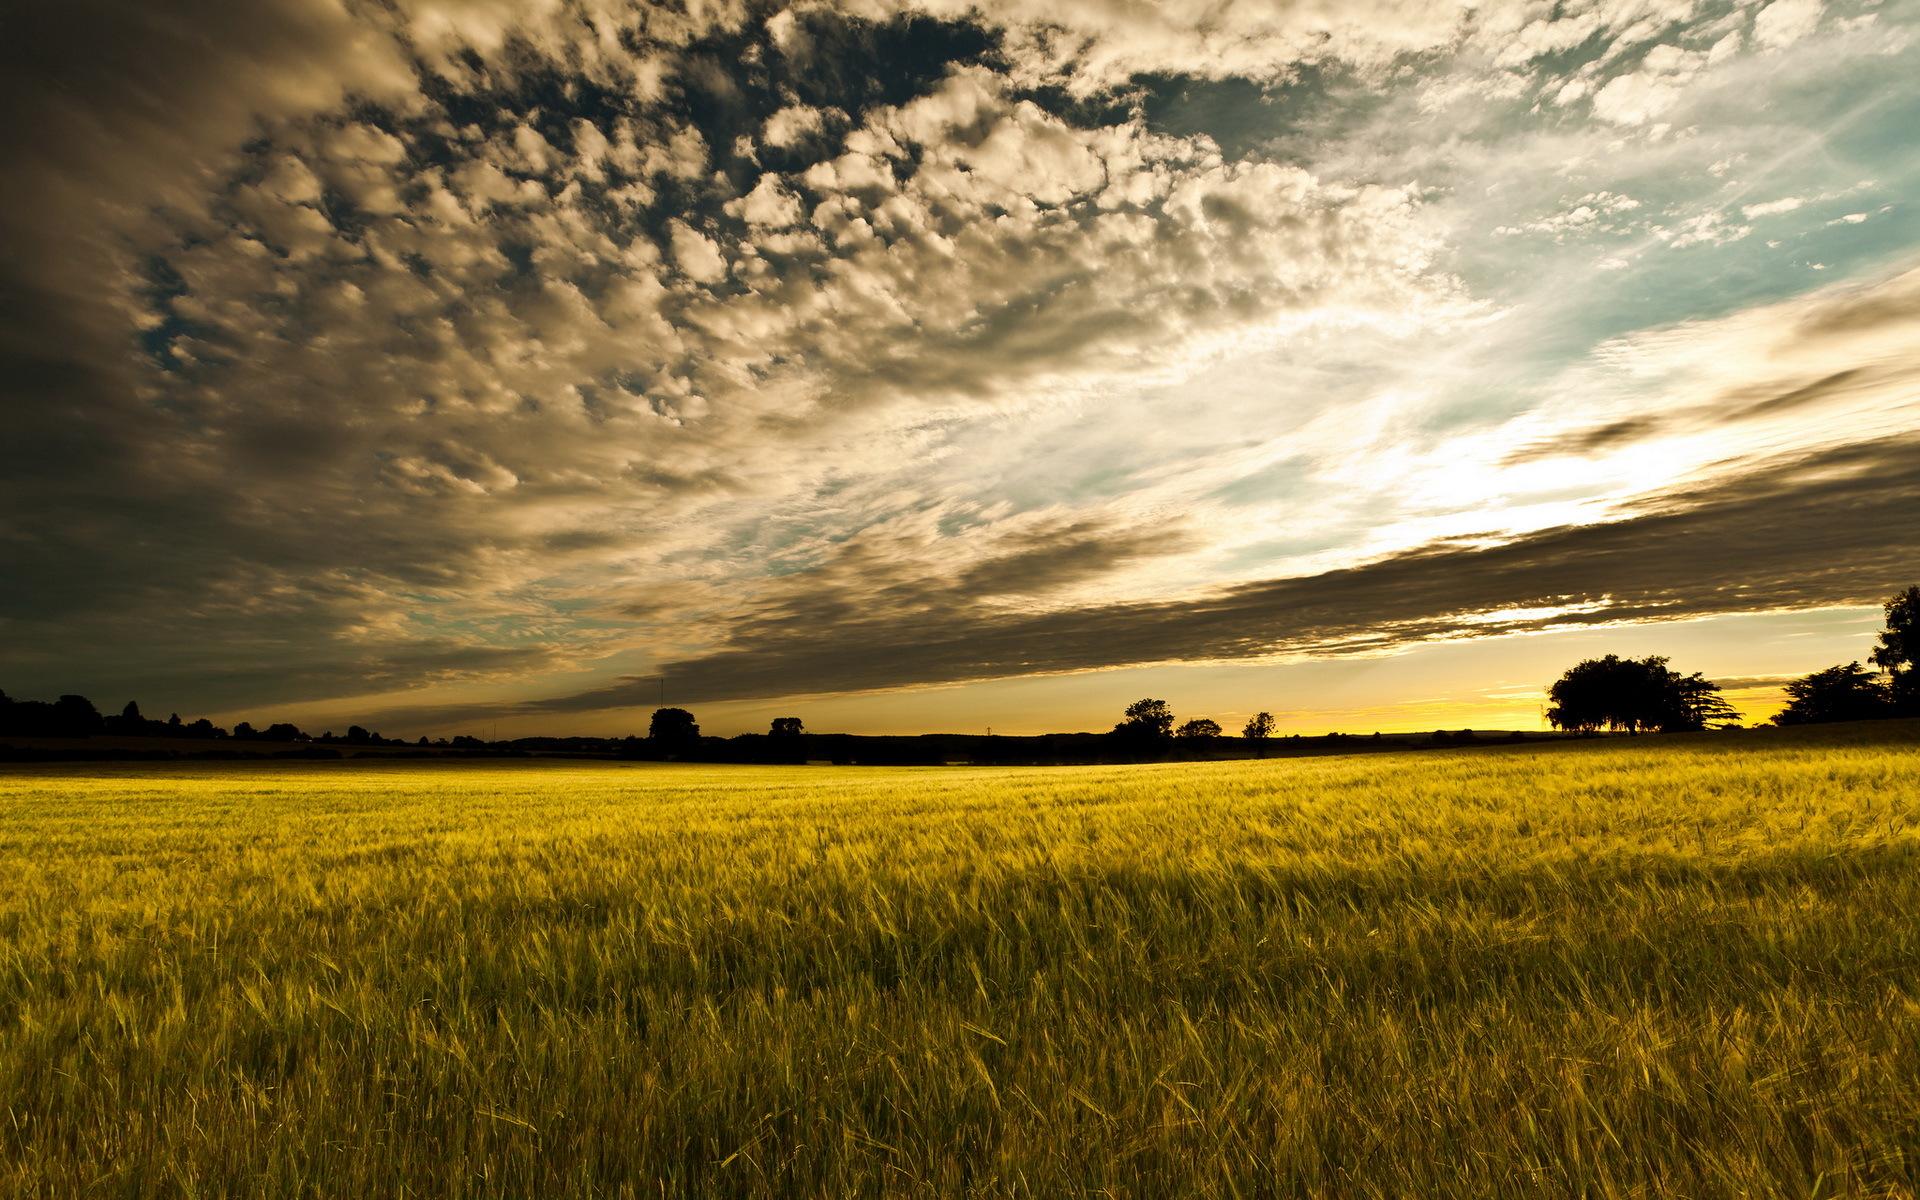 Yellow sunset over the field / 1920 x 1200 / Sunriseandsunset ...